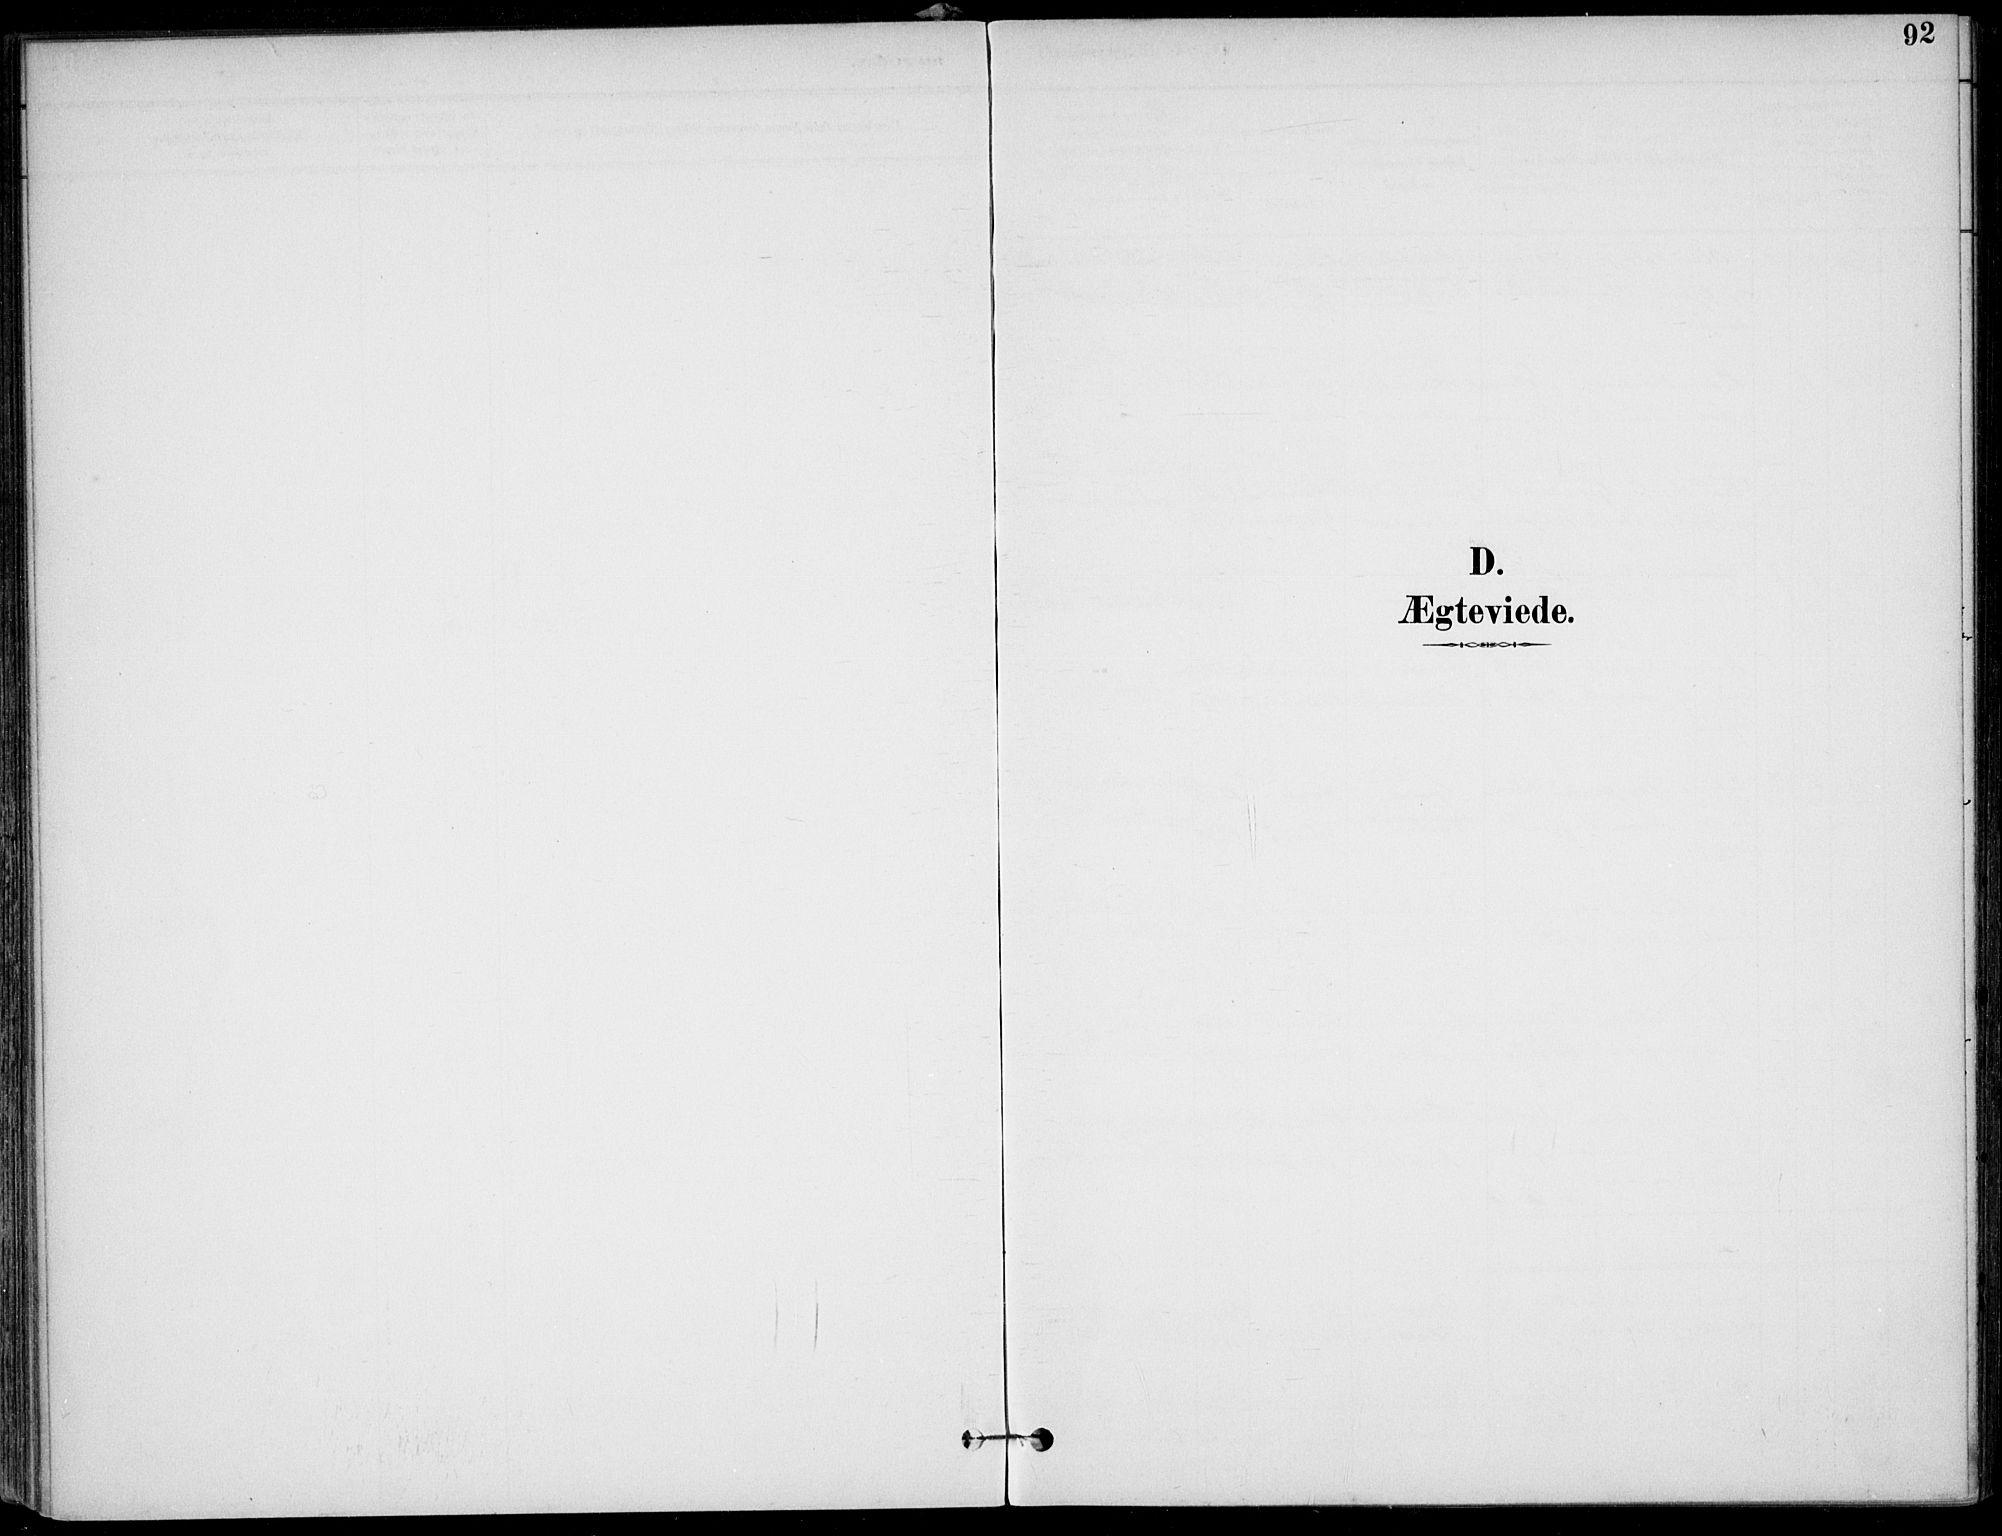 SAKO, Lunde kirkebøker, F/Fa/L0003: Ministerialbok nr. I 3, 1893-1902, s. 92